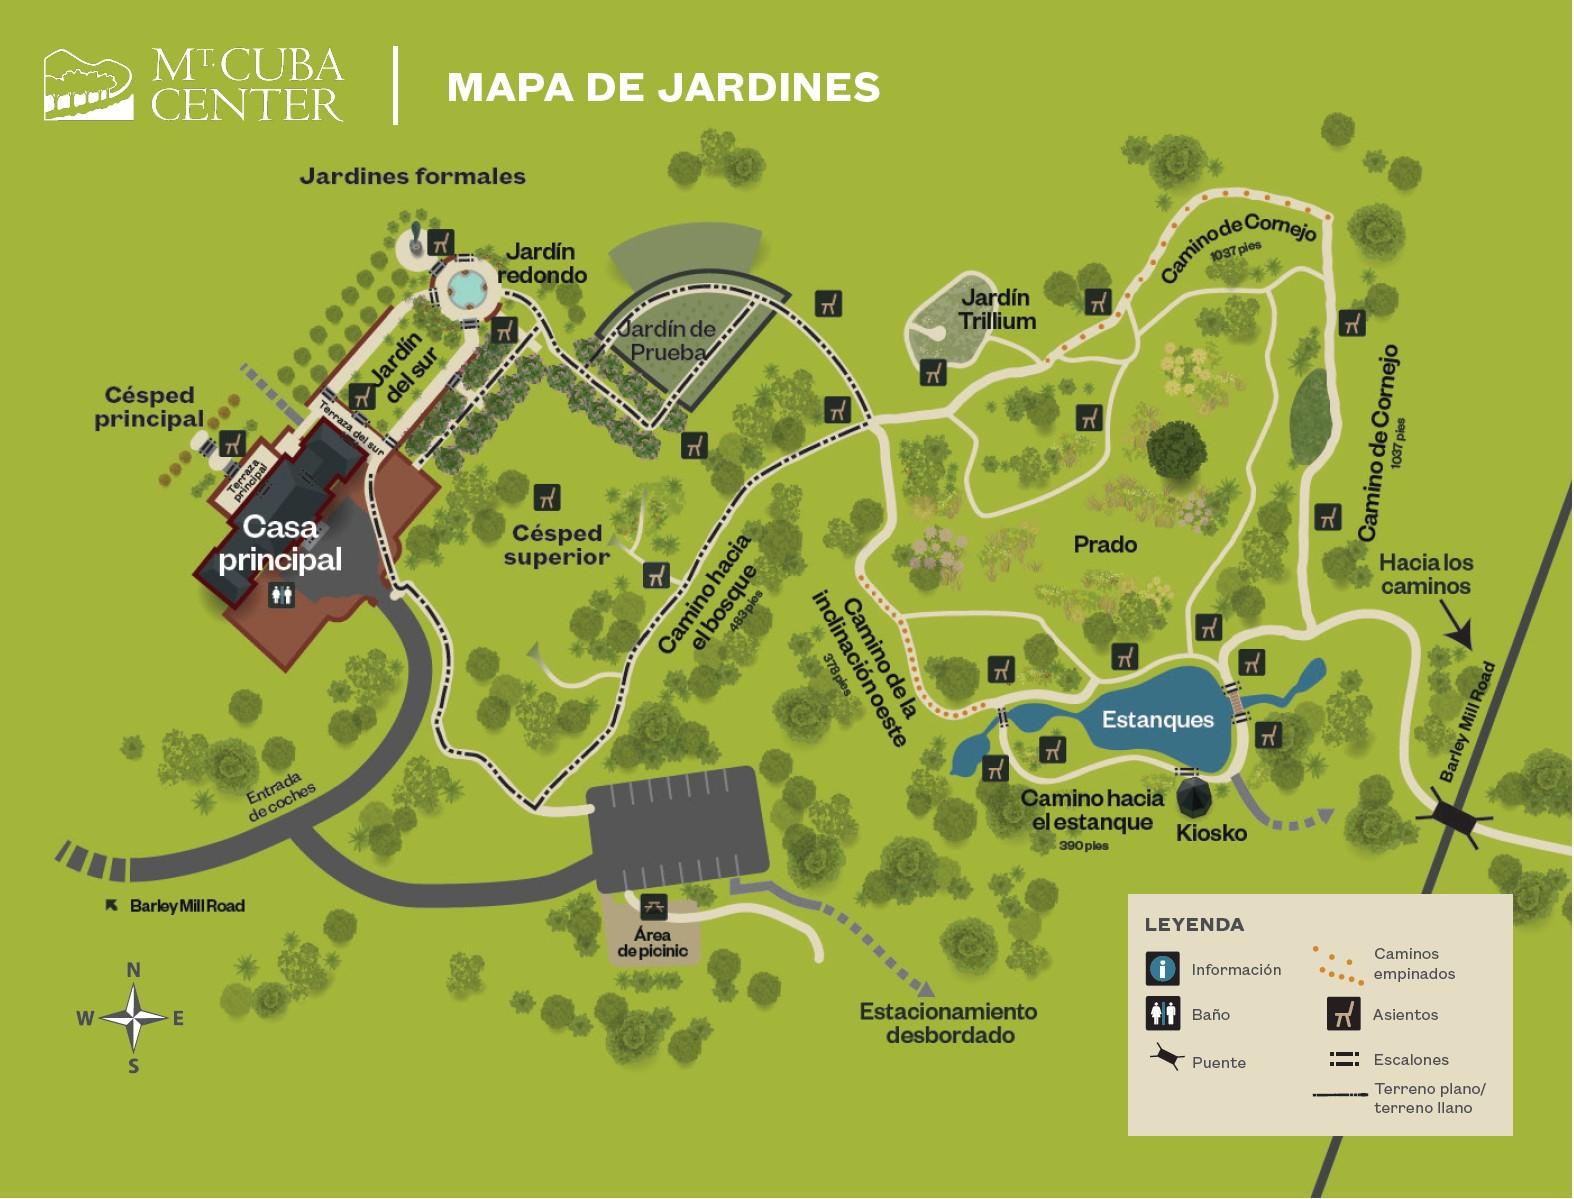 Mapa de Jardines